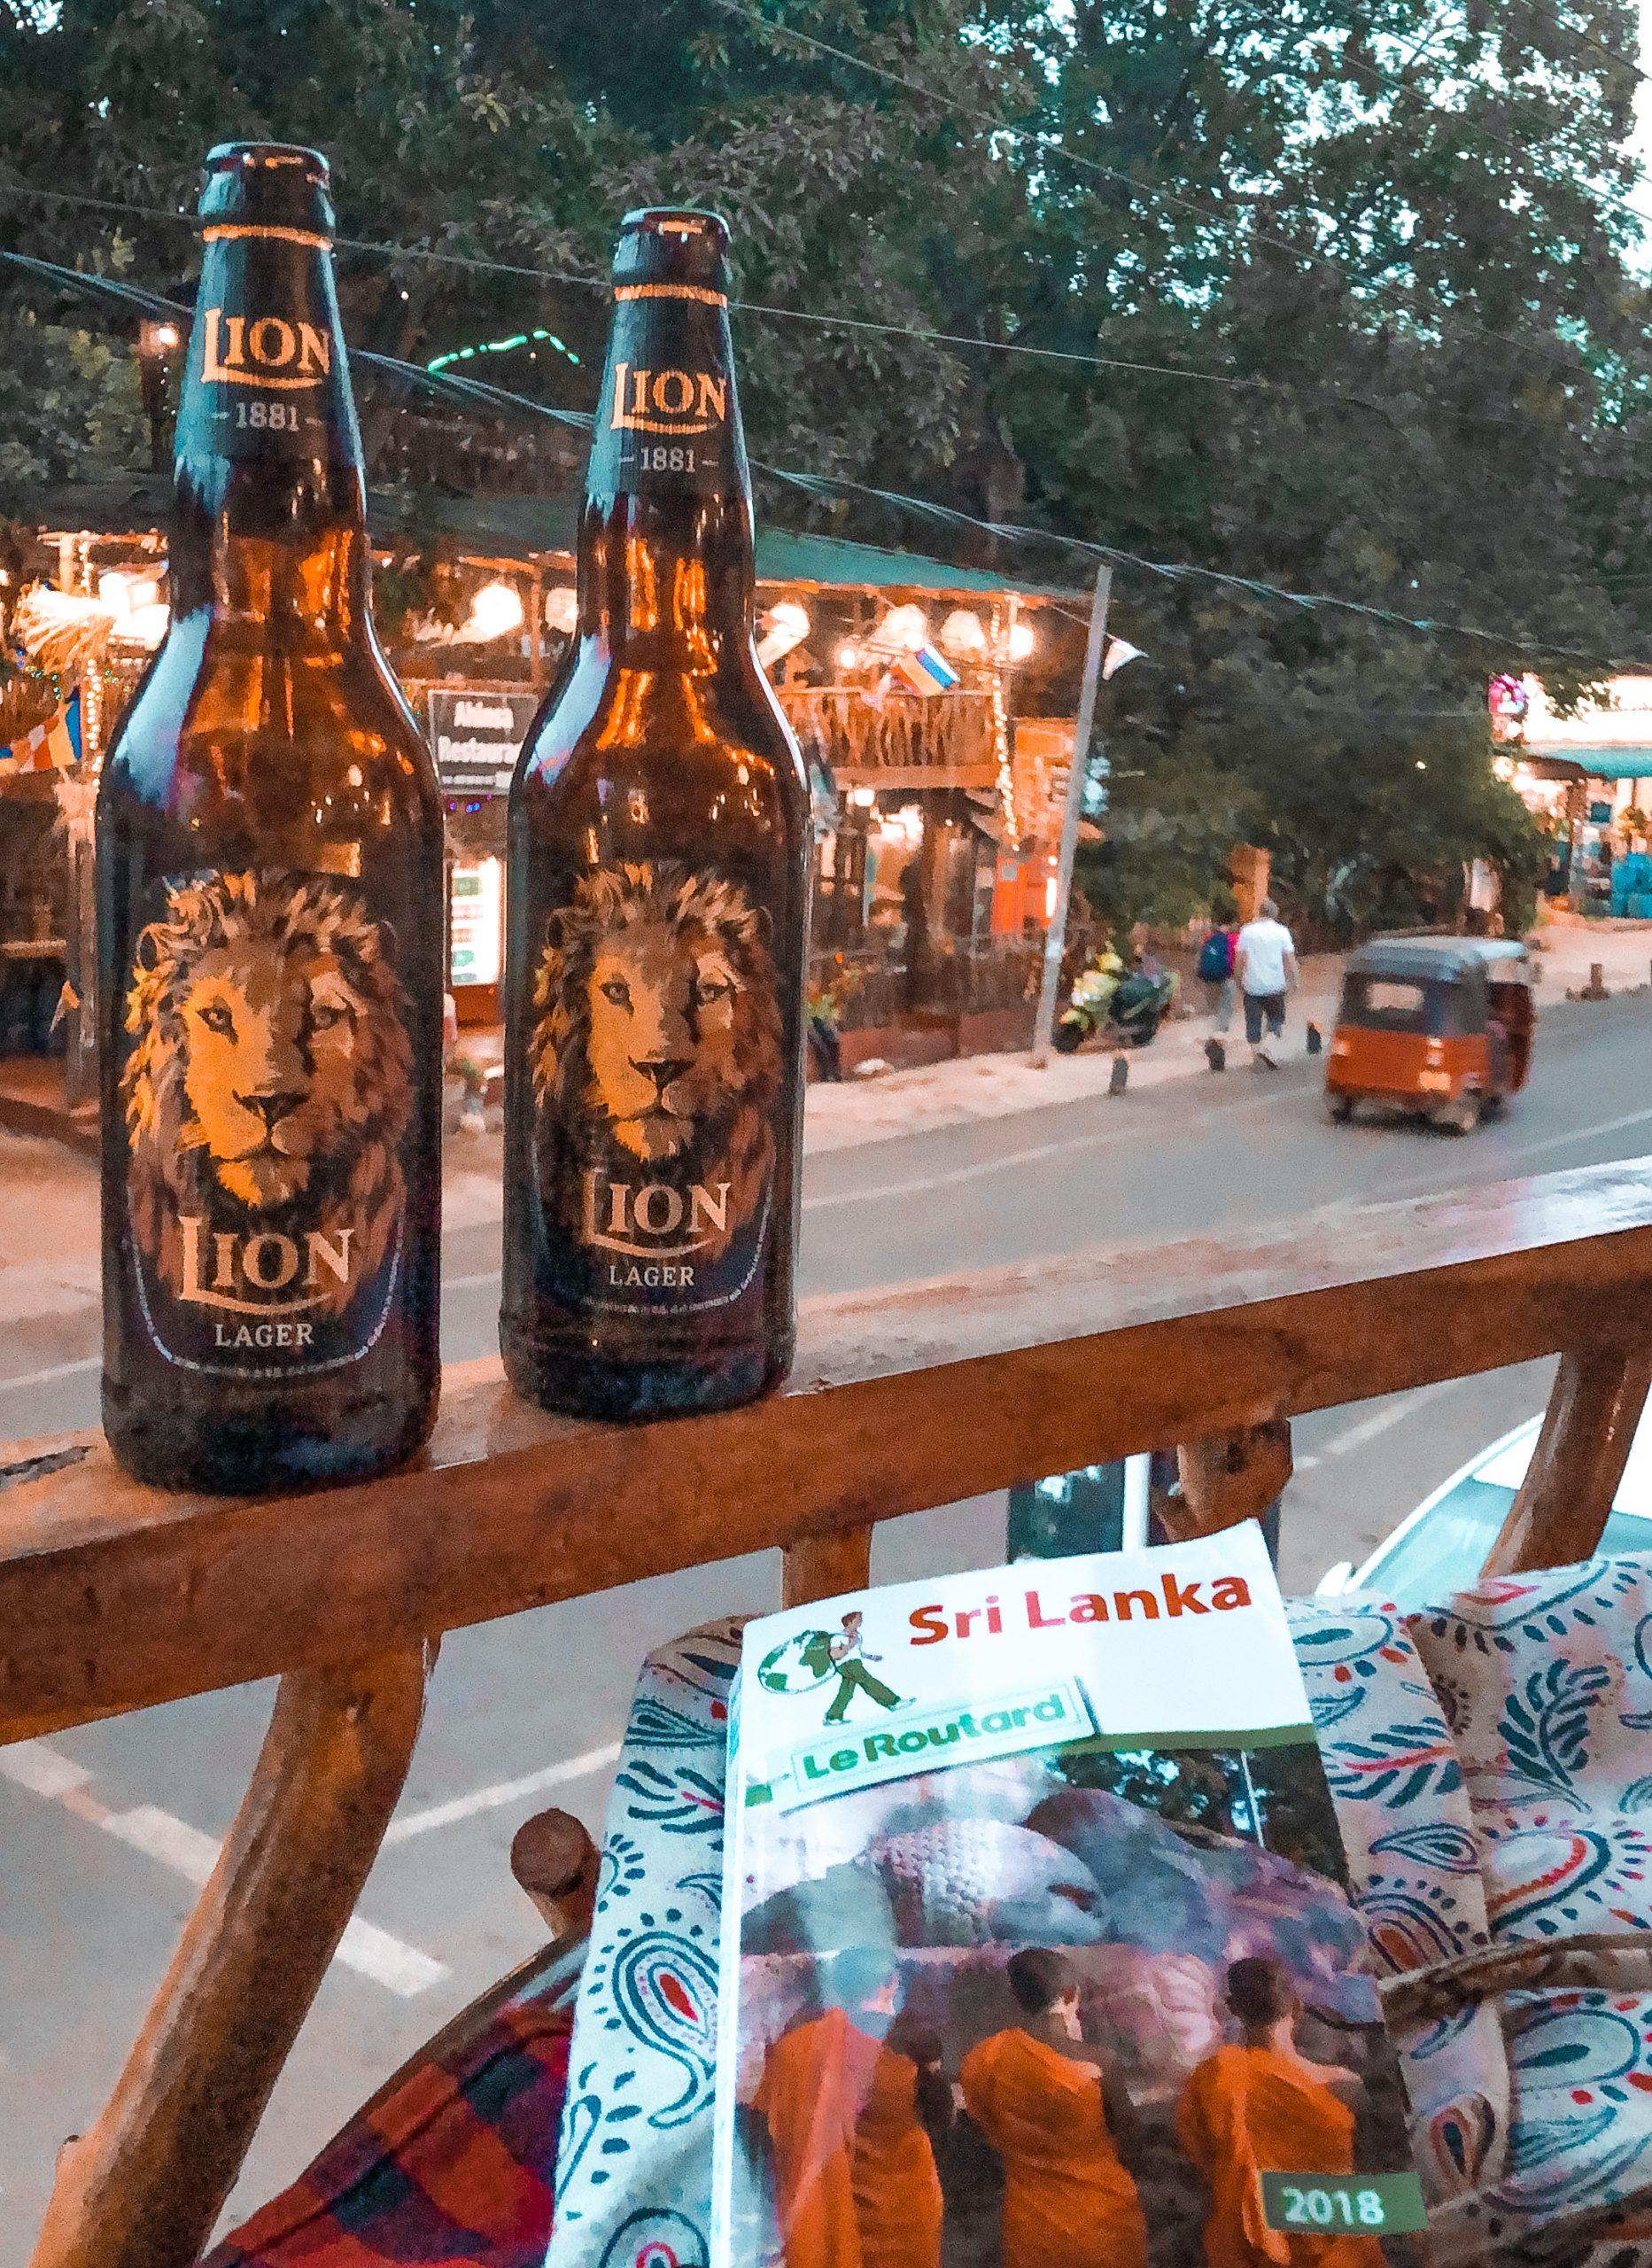 Homestay, bières locales sri lanka, lion's beer